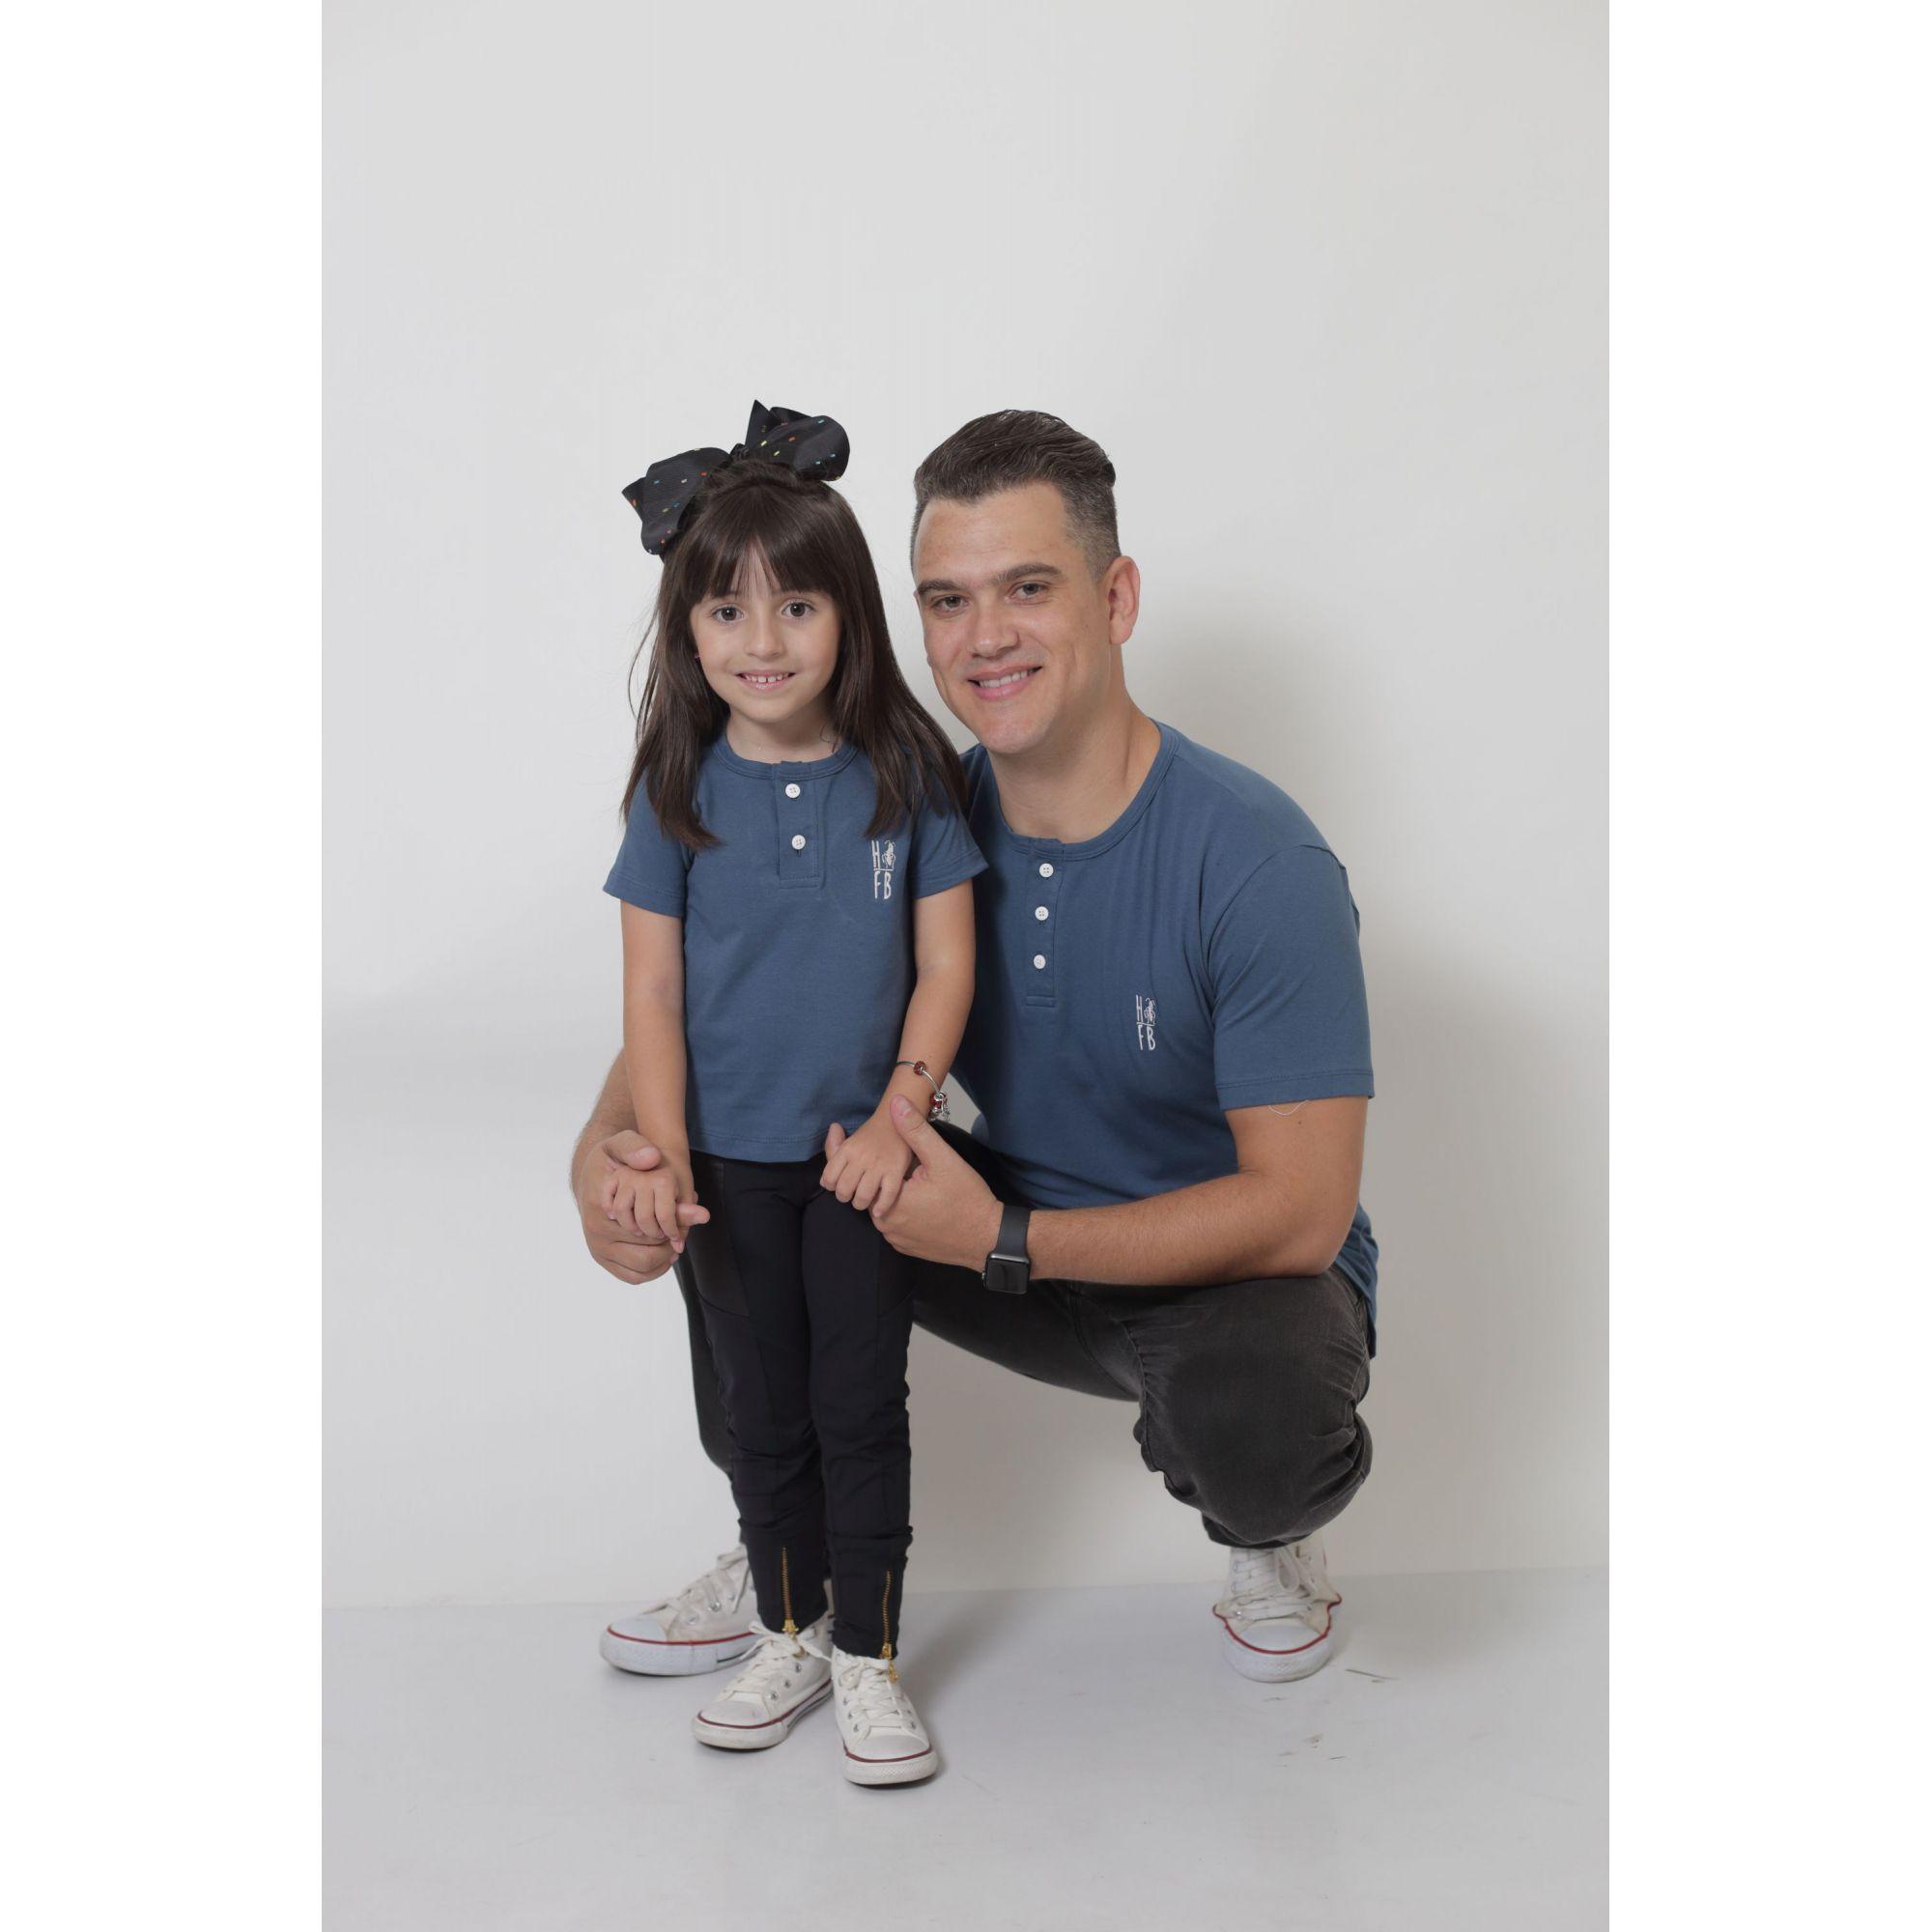 PAI E FILHO > 02 T-Shirts ou Body Henley - Azul Petróleo  [Coleção Tal Pai Tal Filho]  - Heitor Fashion Brazil